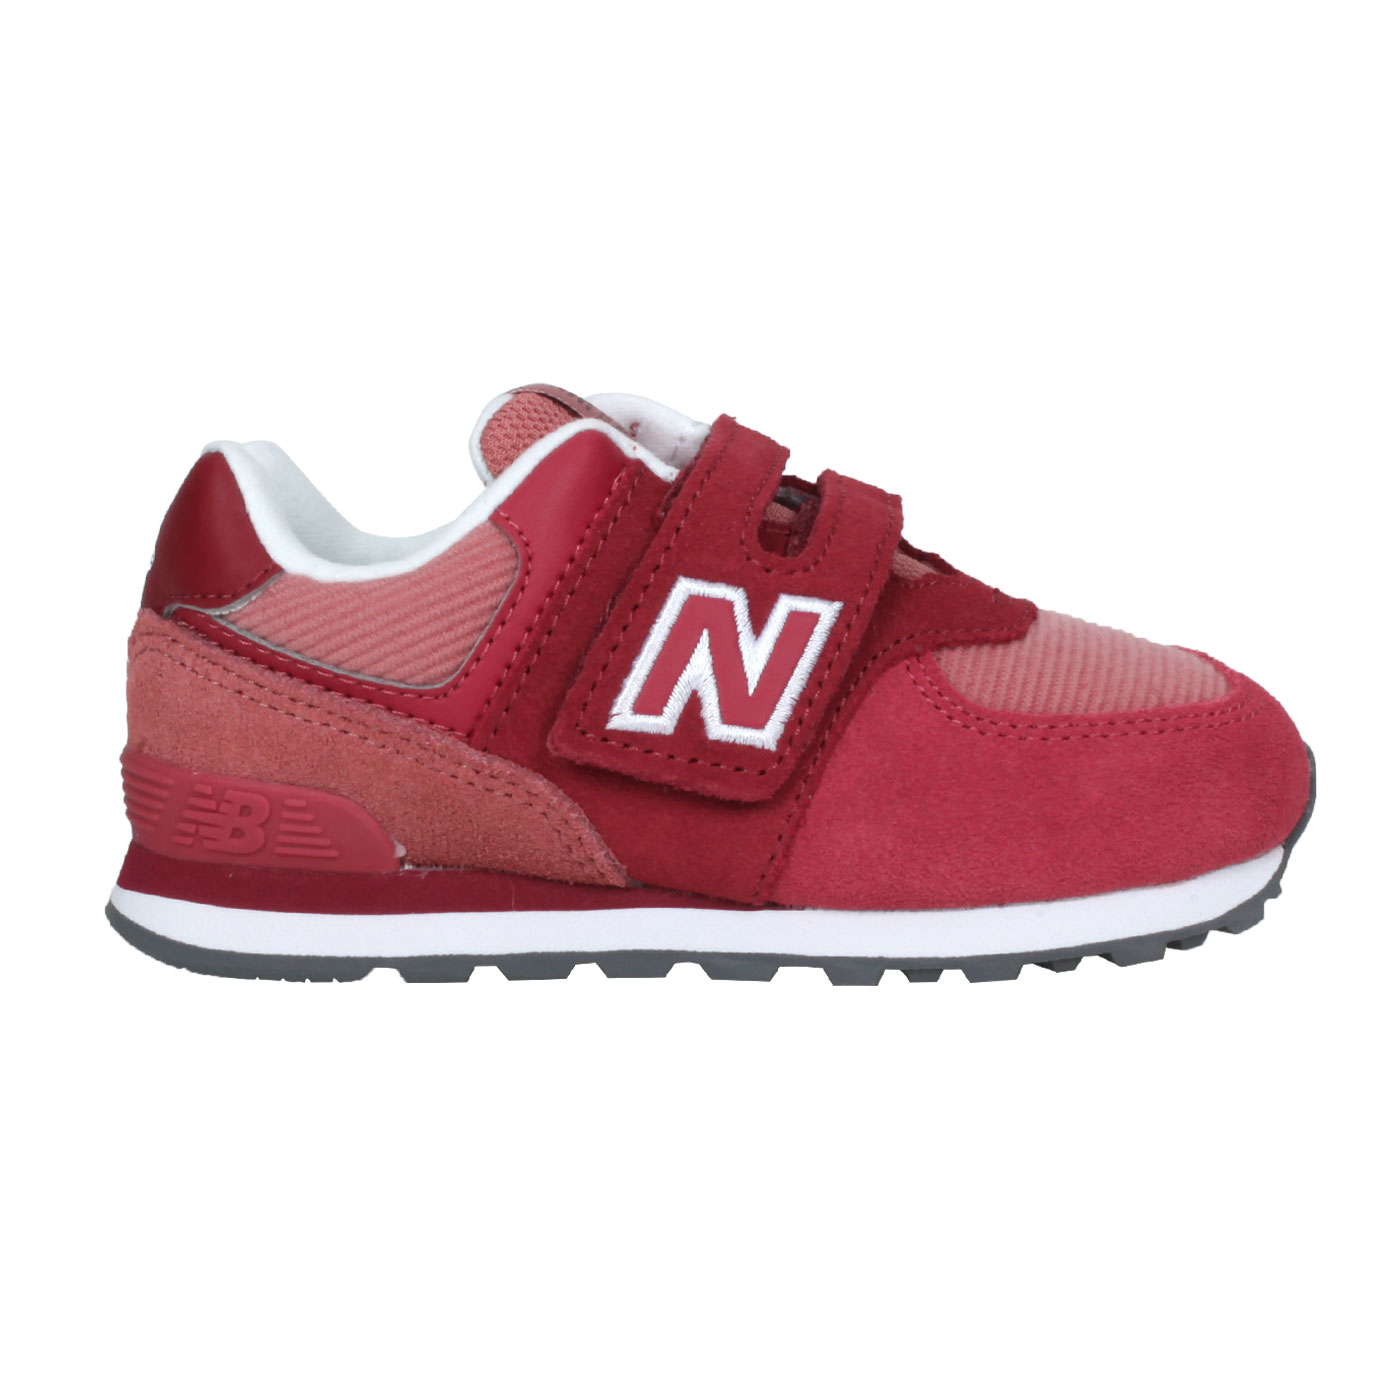 NEW BALANCE 小童休閒運動鞋-WIDE IV574WT1 - 酒紅白